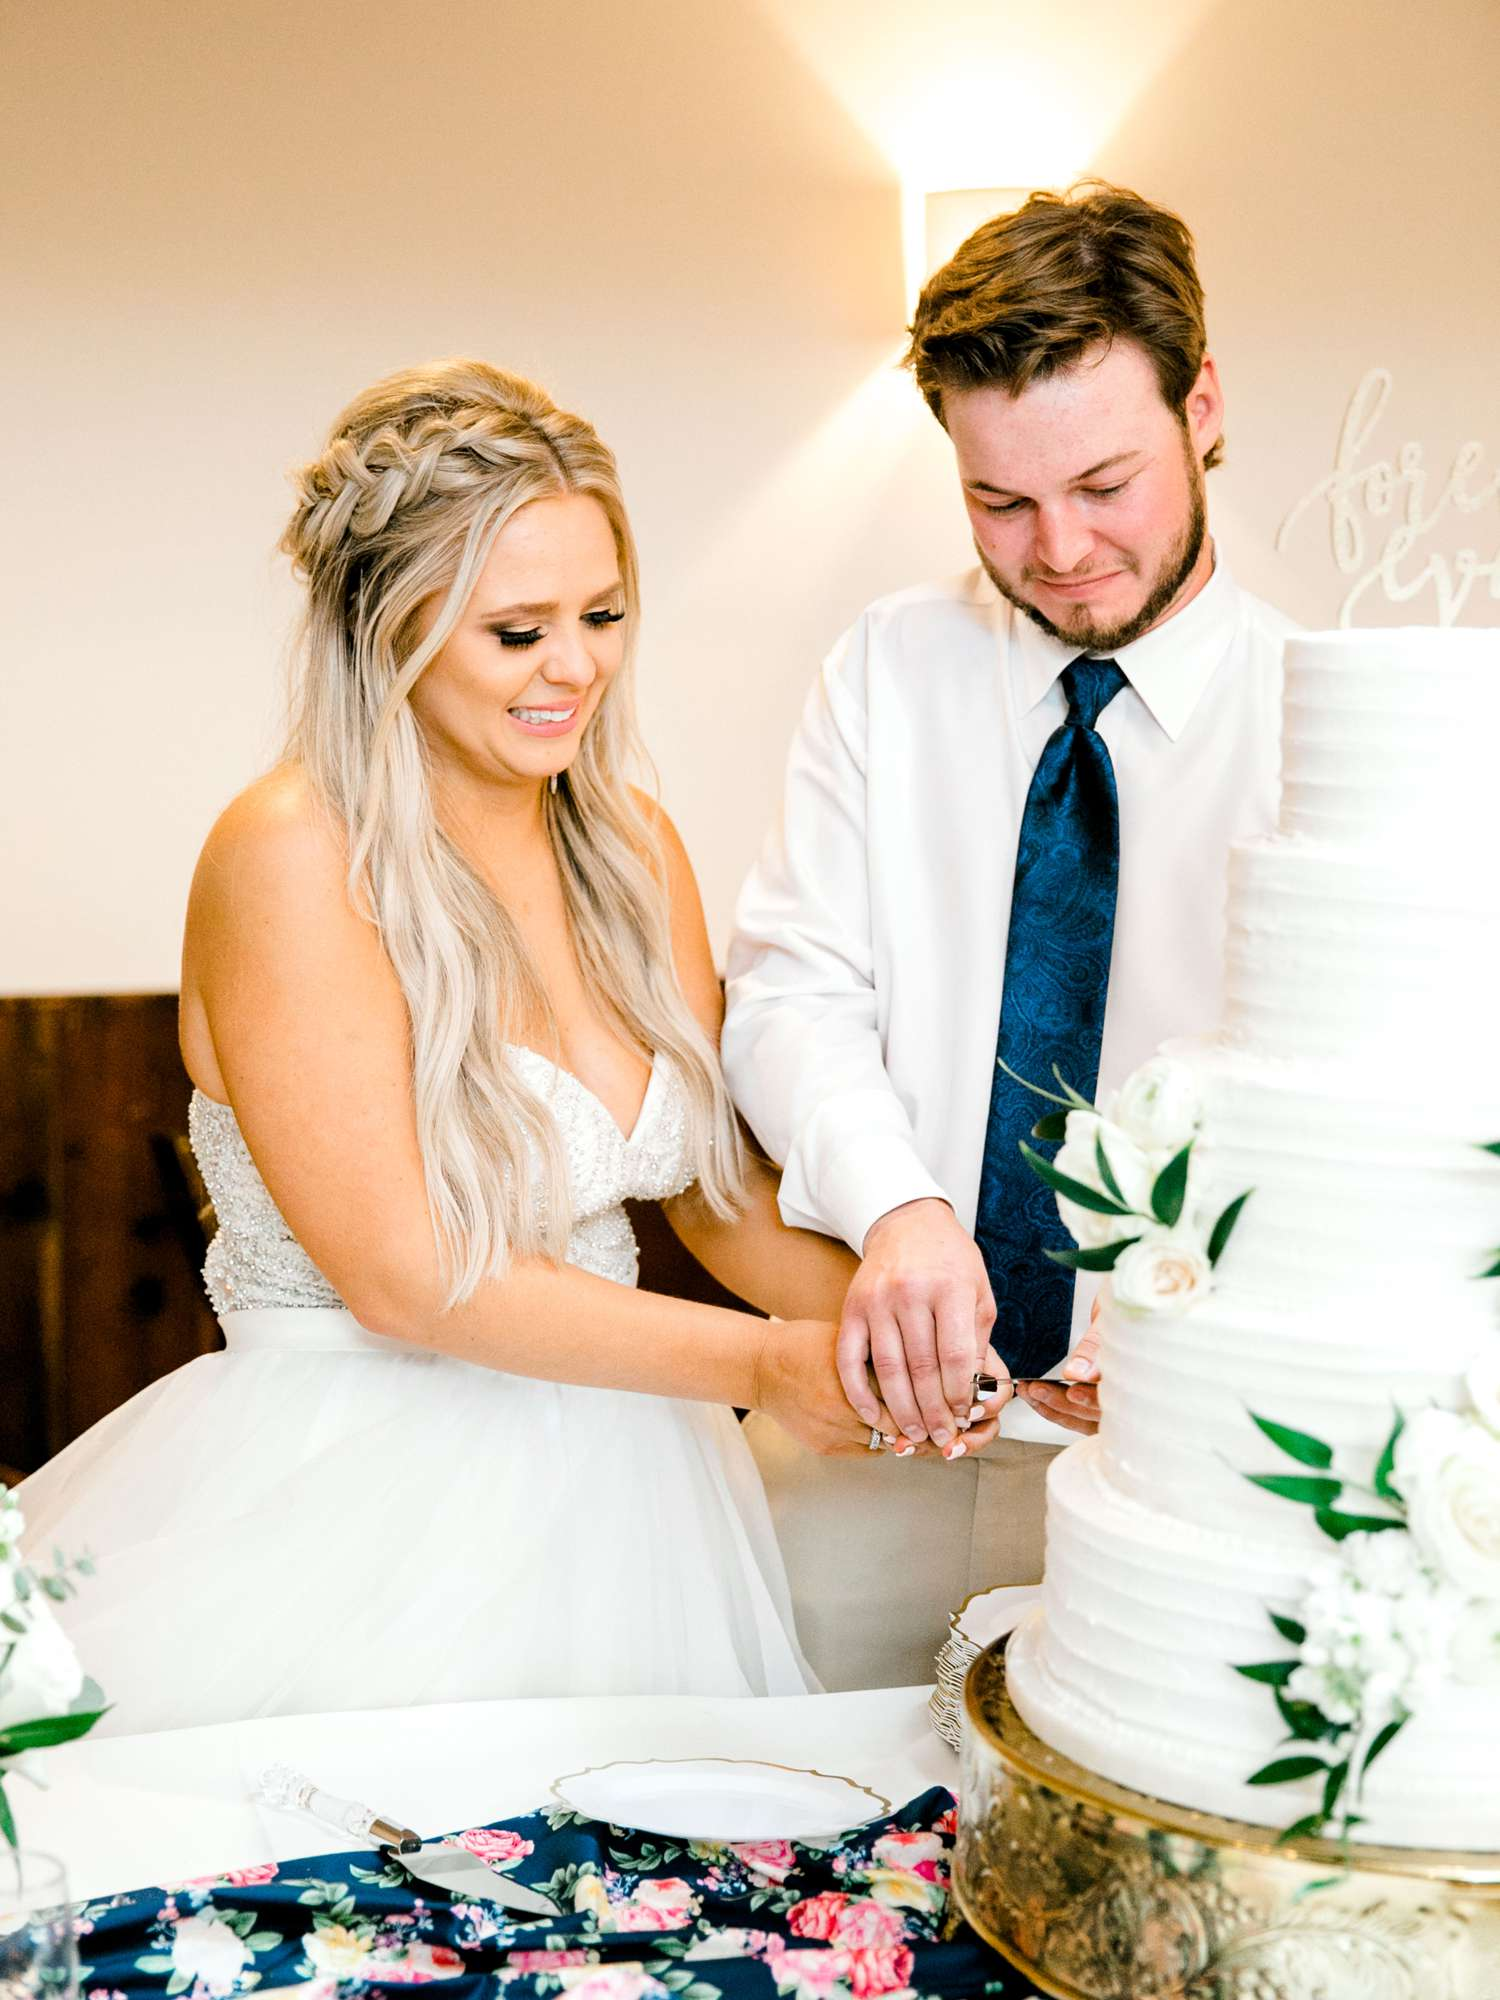 HAYLEE+JUSTIN+GREGORY+HERITAGE_HAUS_AUSTIN_TEXAS_WEDDING_0161.jpg